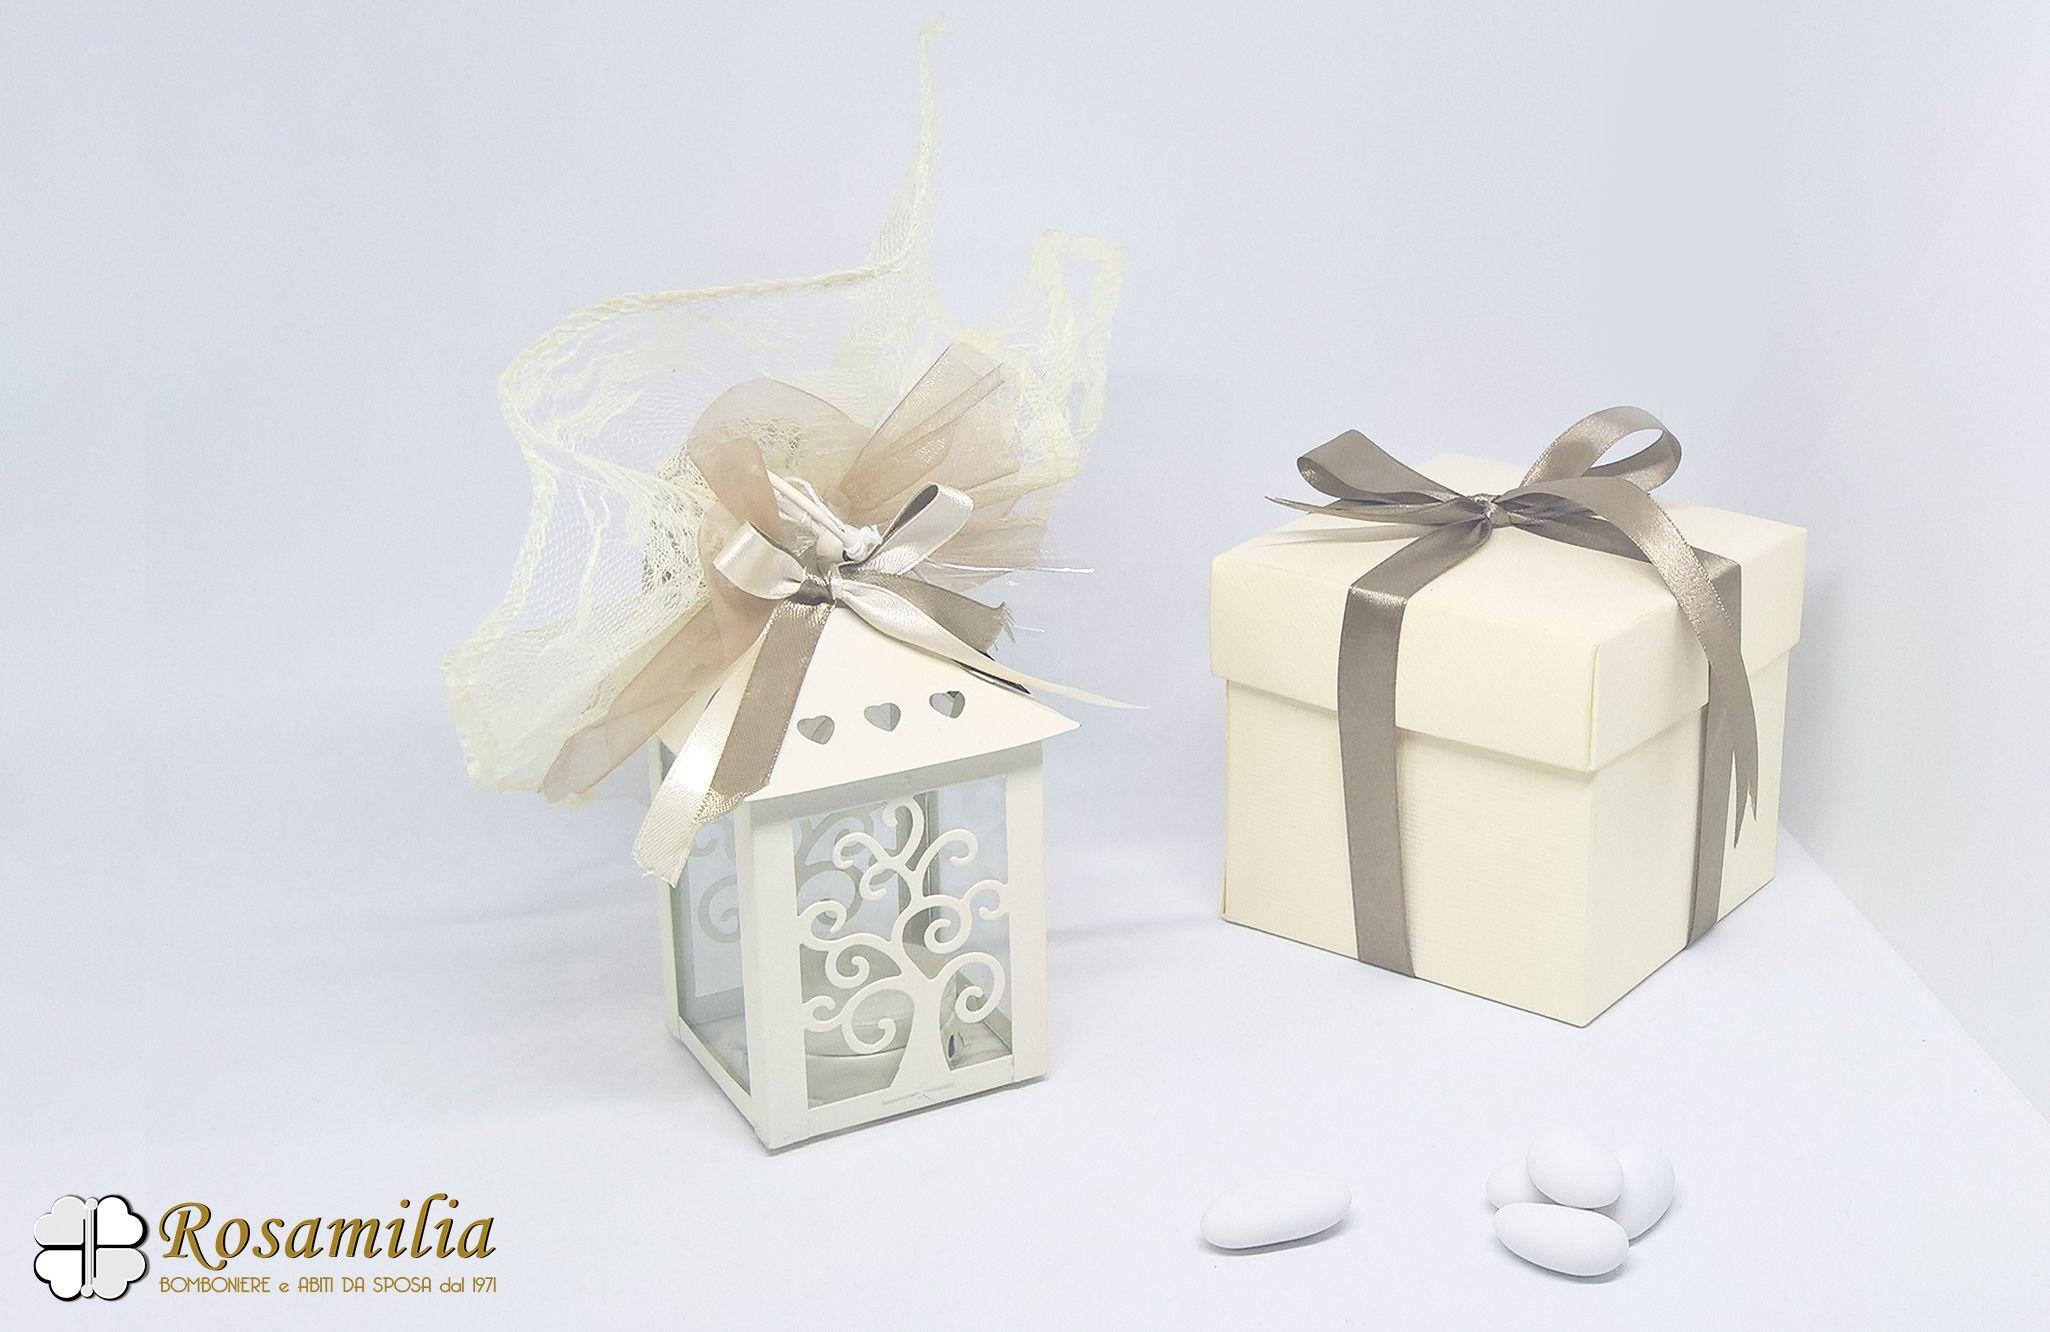 Bomboniere Matrimonio Lanterna.Bomboniere Matrimonio Lanterna Con Albero Della Vita Bomboniere